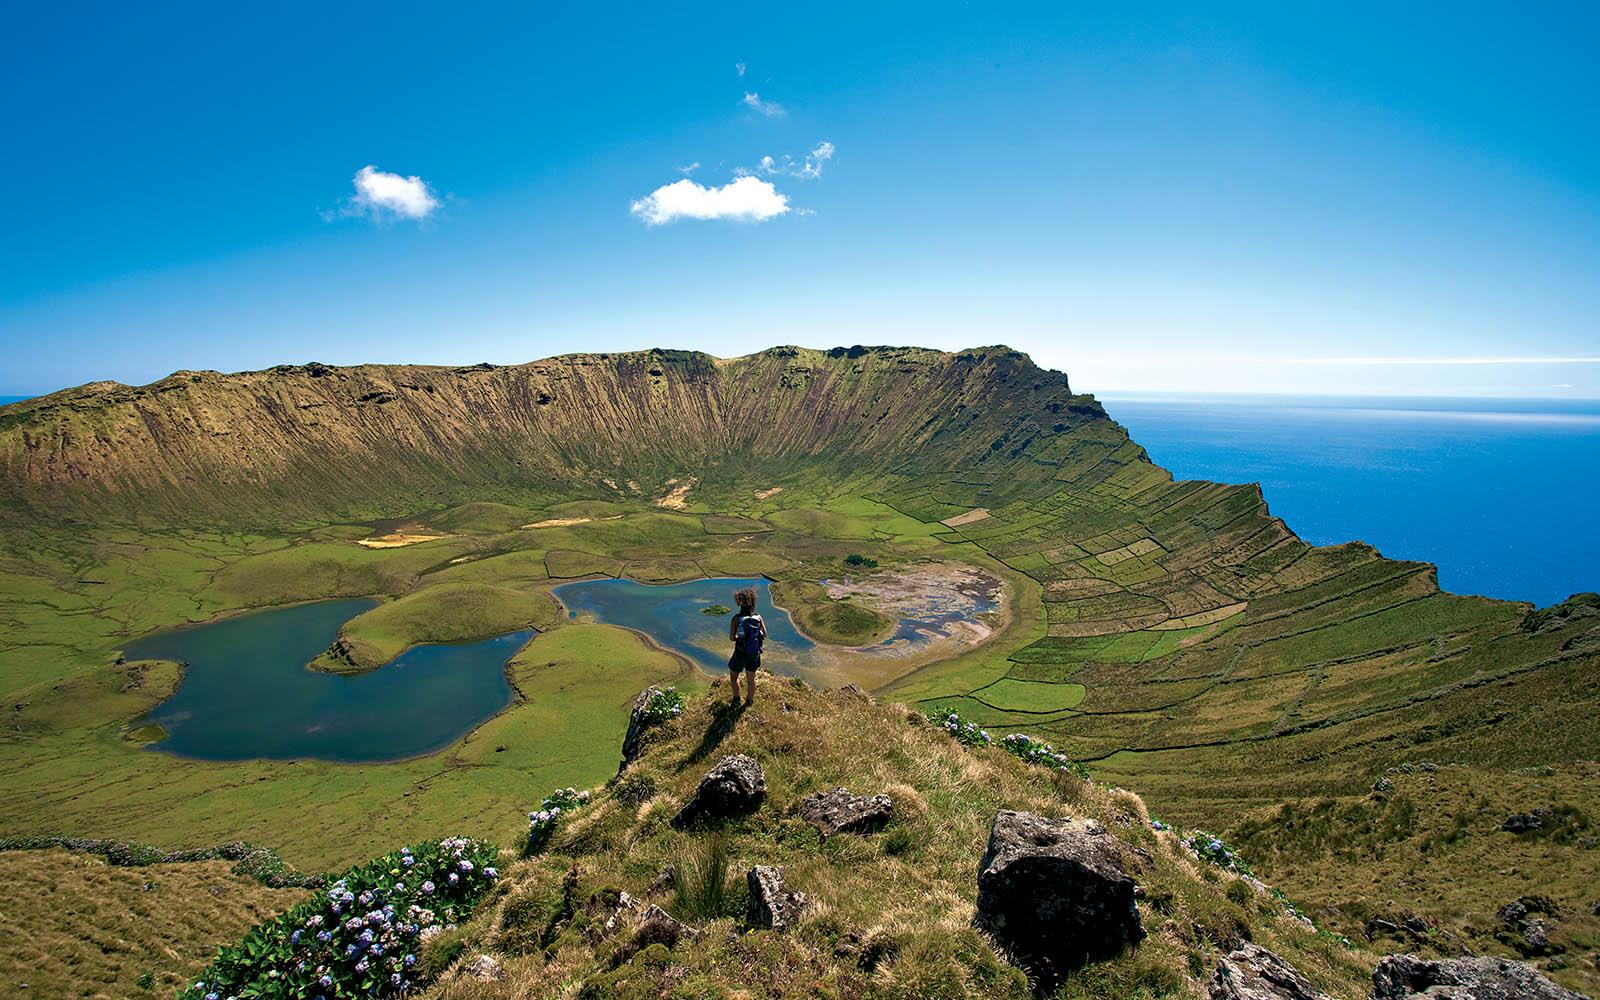 sites de rencontres Açores Interracial rencontres site Web Royaume-Uni